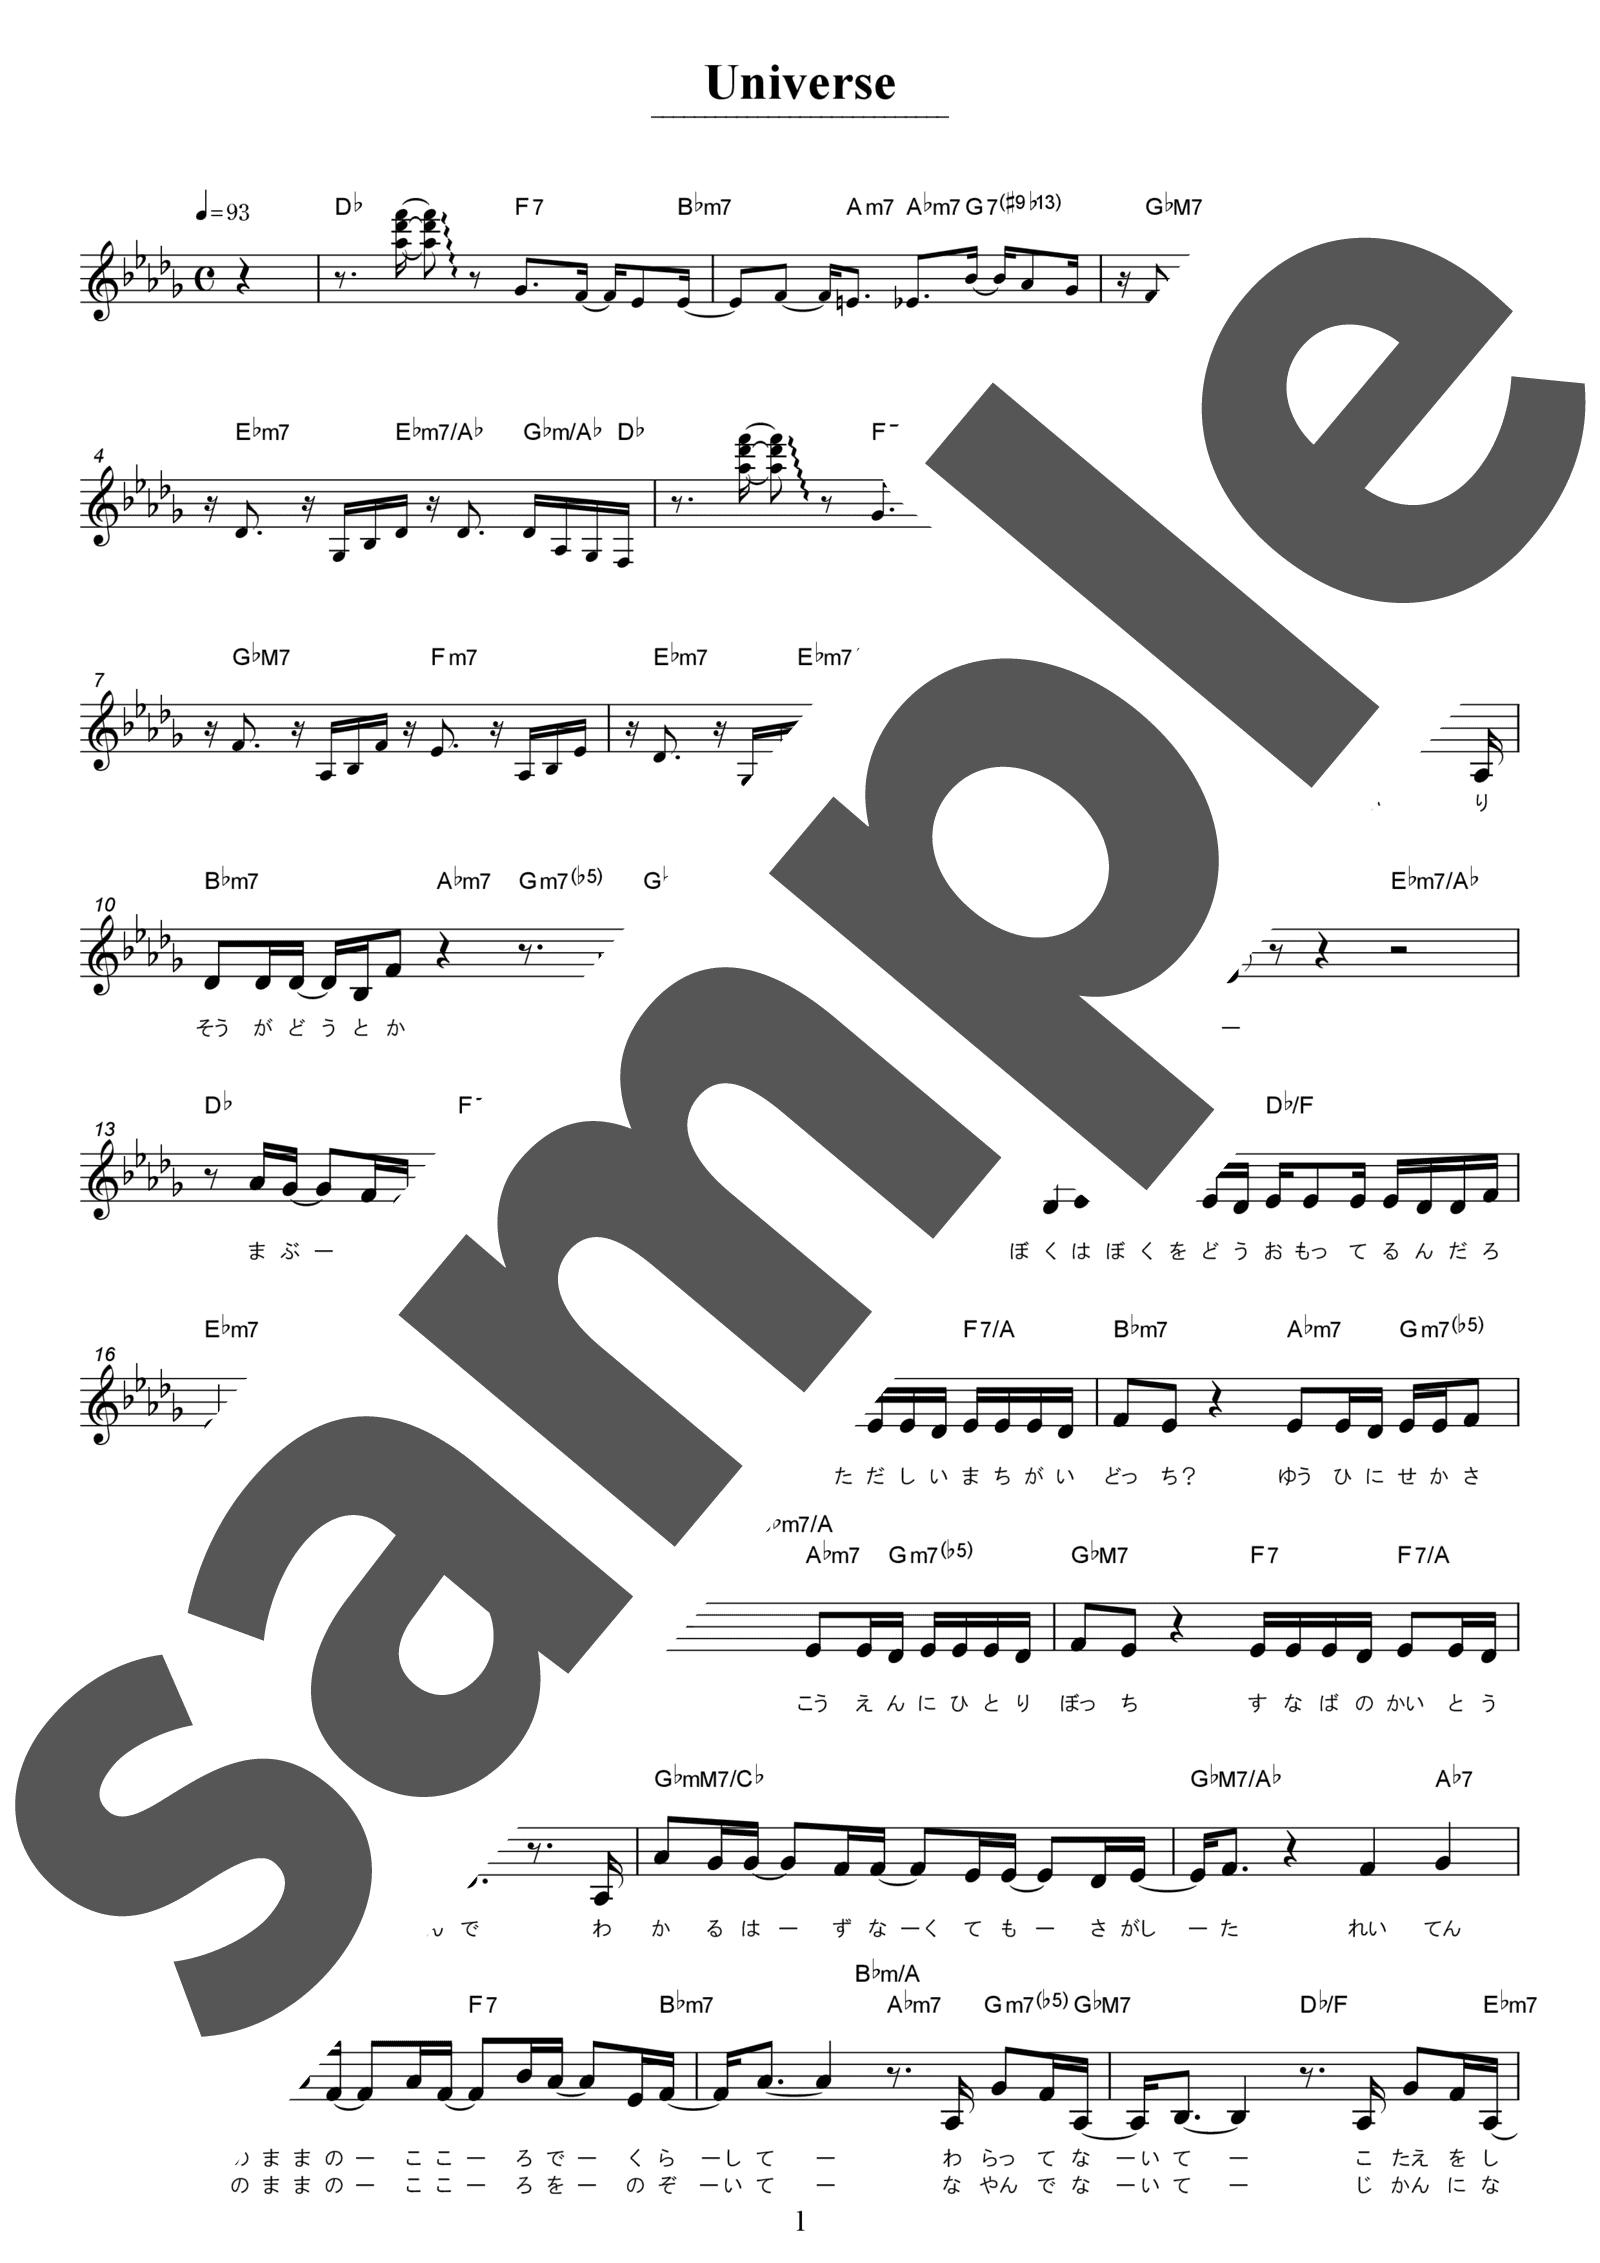 「Universe」のサンプル楽譜